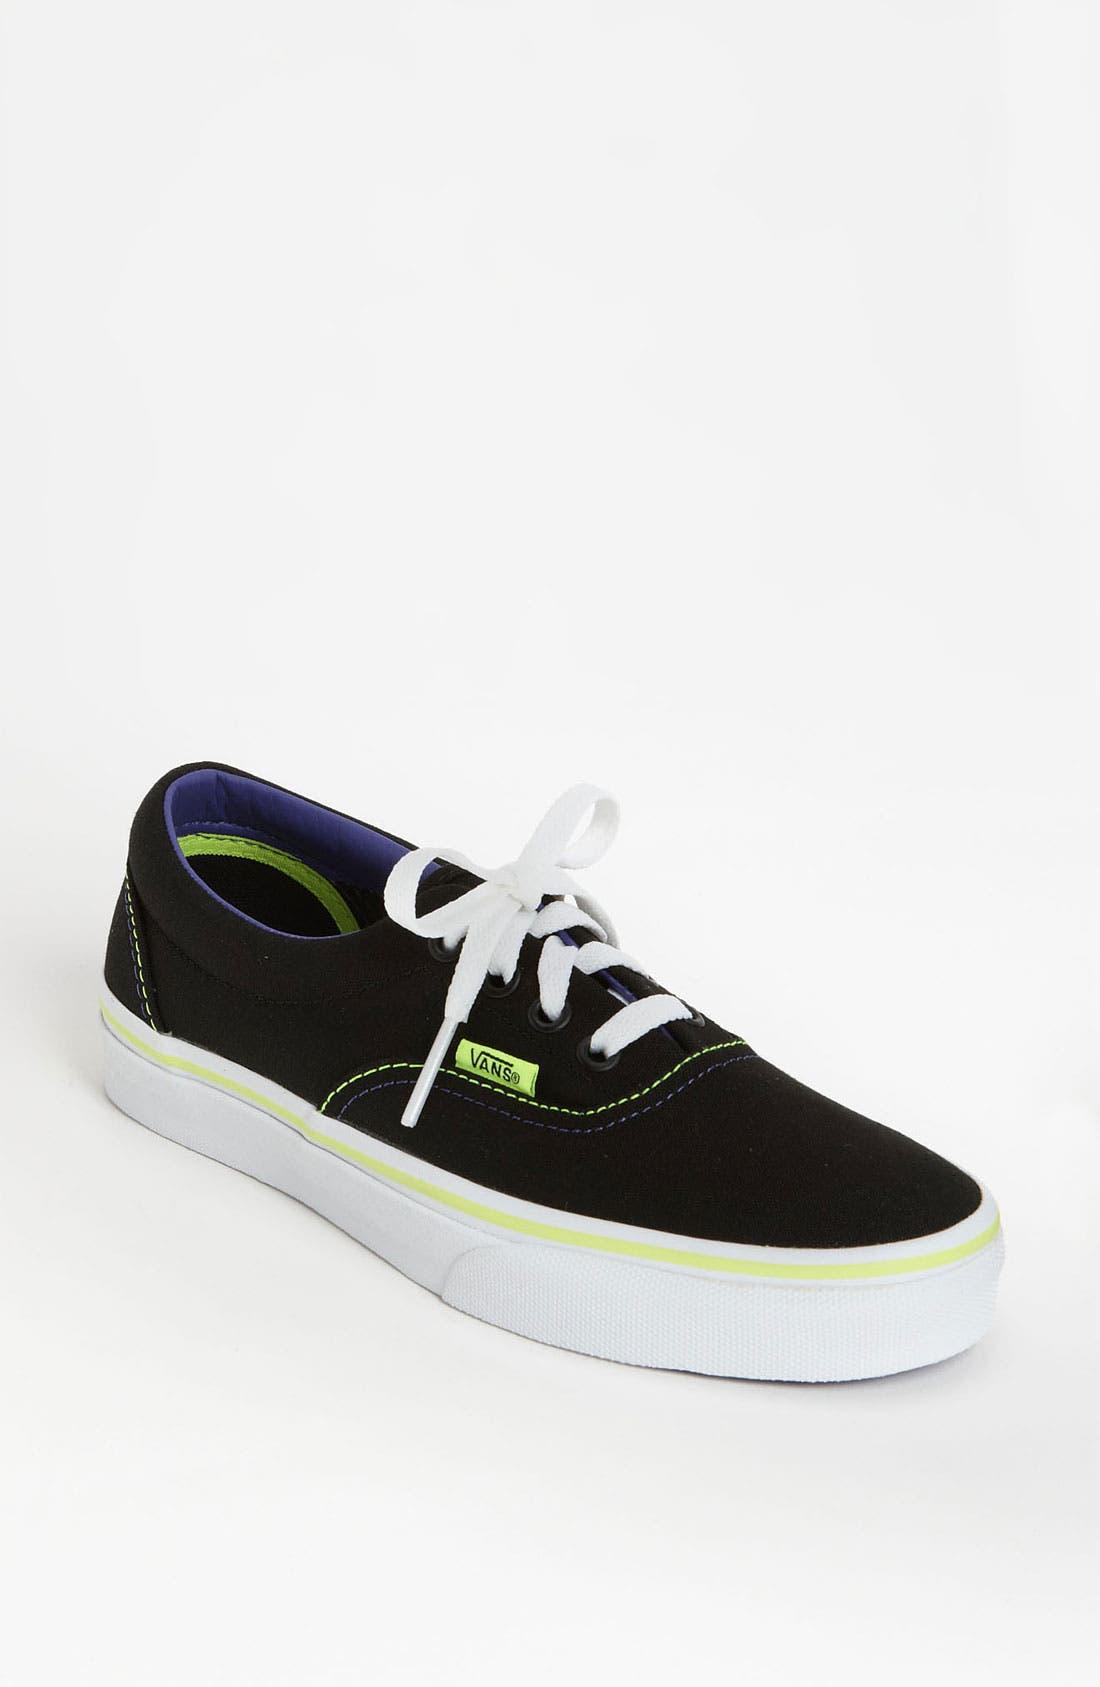 Alternate Image 1 Selected - Vans 'Era - Pop' Sneaker (Women)